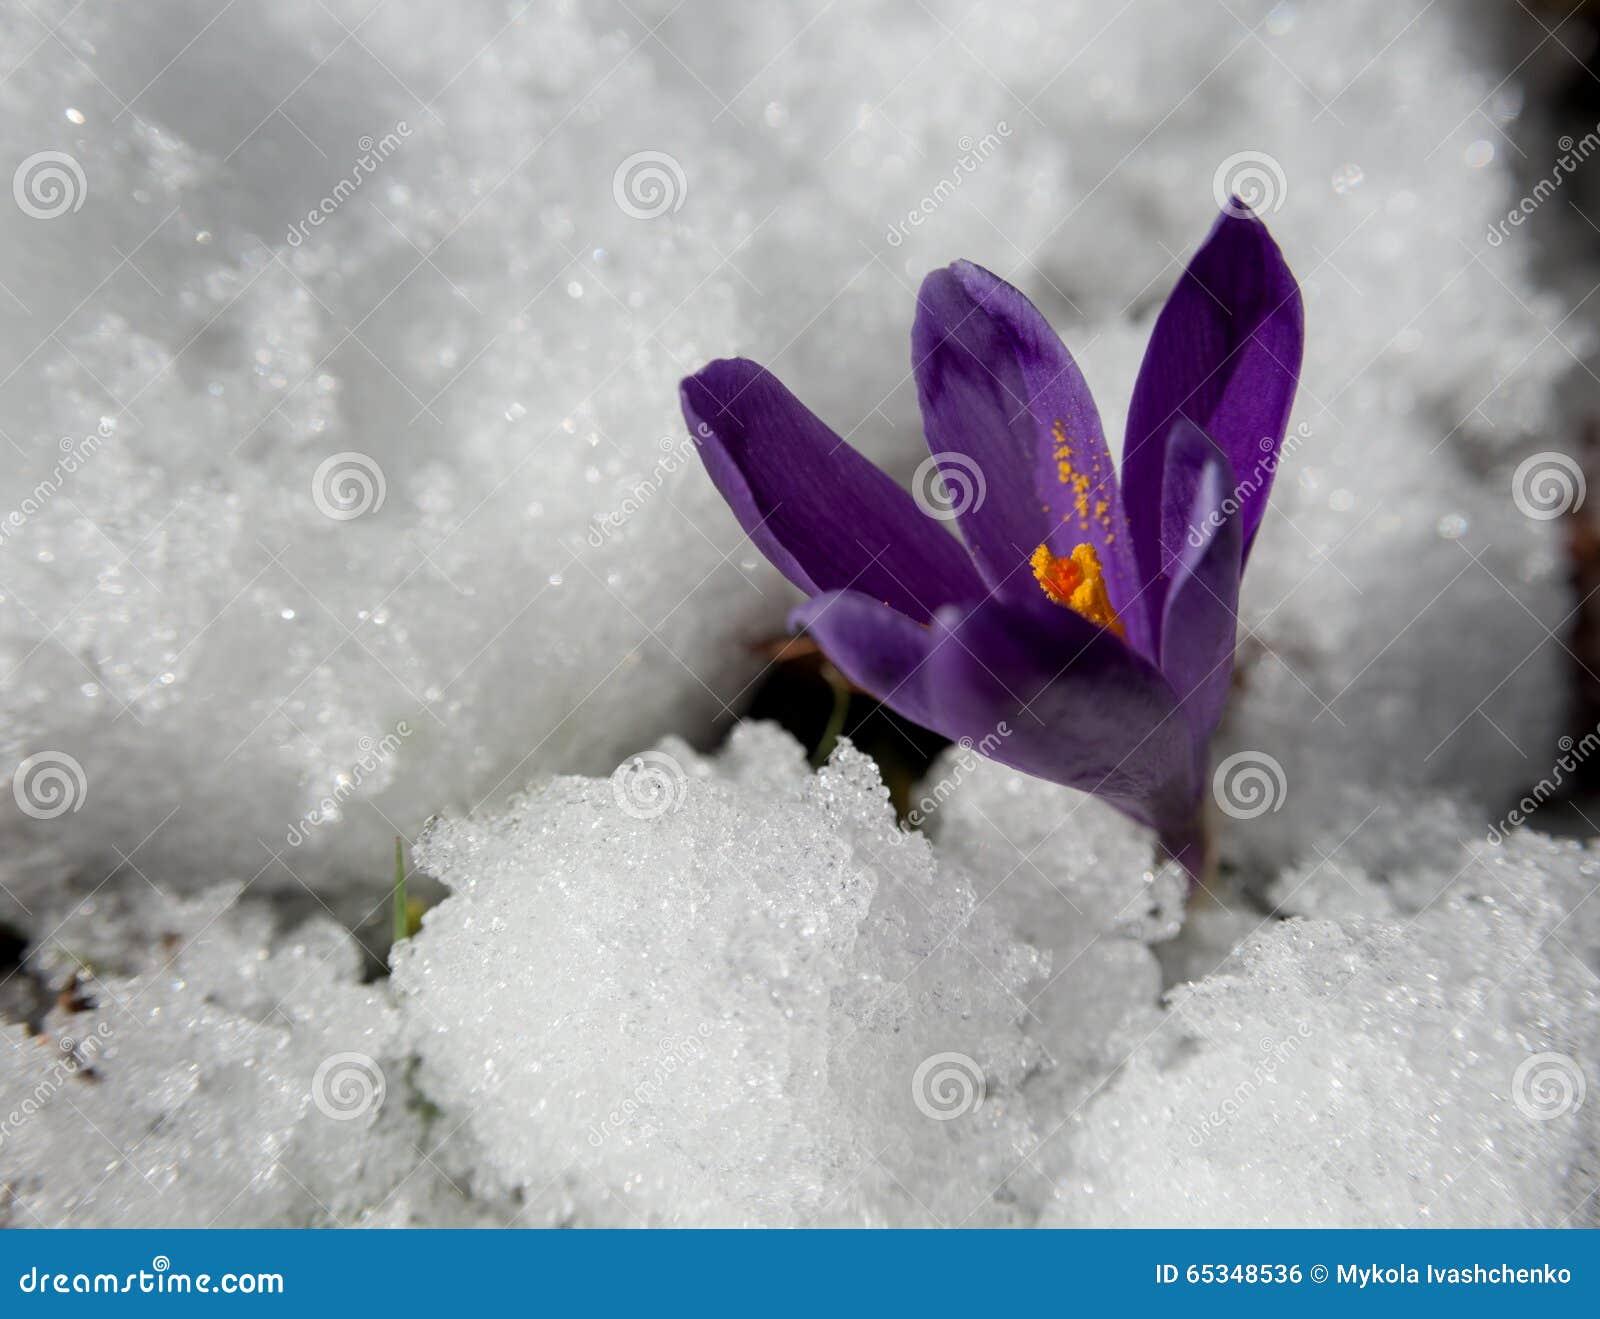 la fin de l 39 hiver fleur de crocus photo stock image 65348536. Black Bedroom Furniture Sets. Home Design Ideas